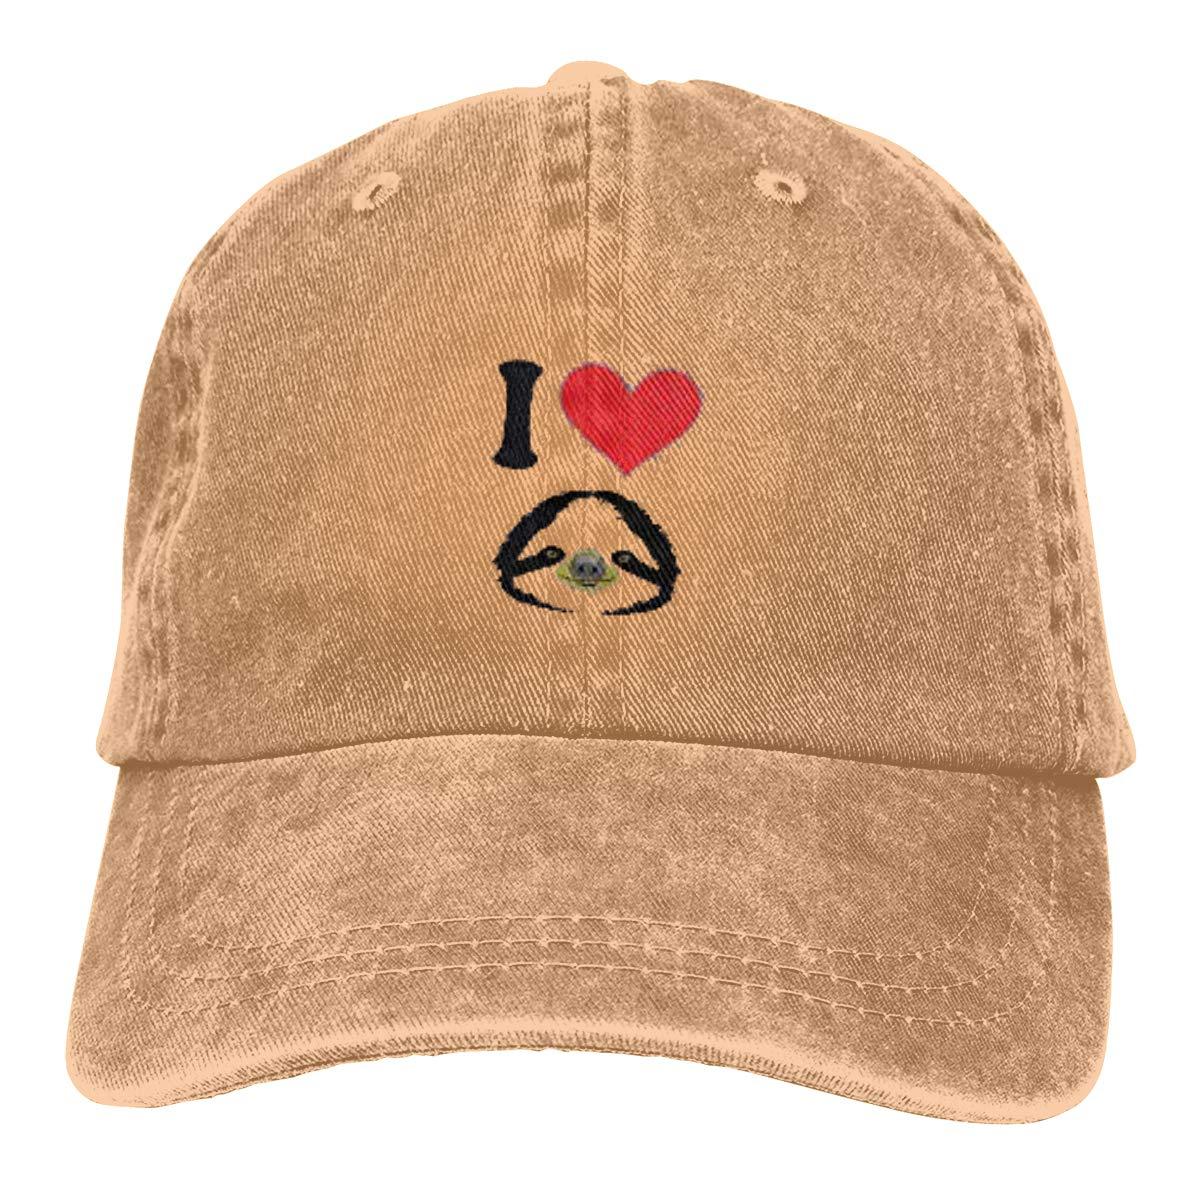 I Love Sloth Unisex Baseball Cap Cotton Denim Funny Adjustable Sun Hat for Men Women Youth